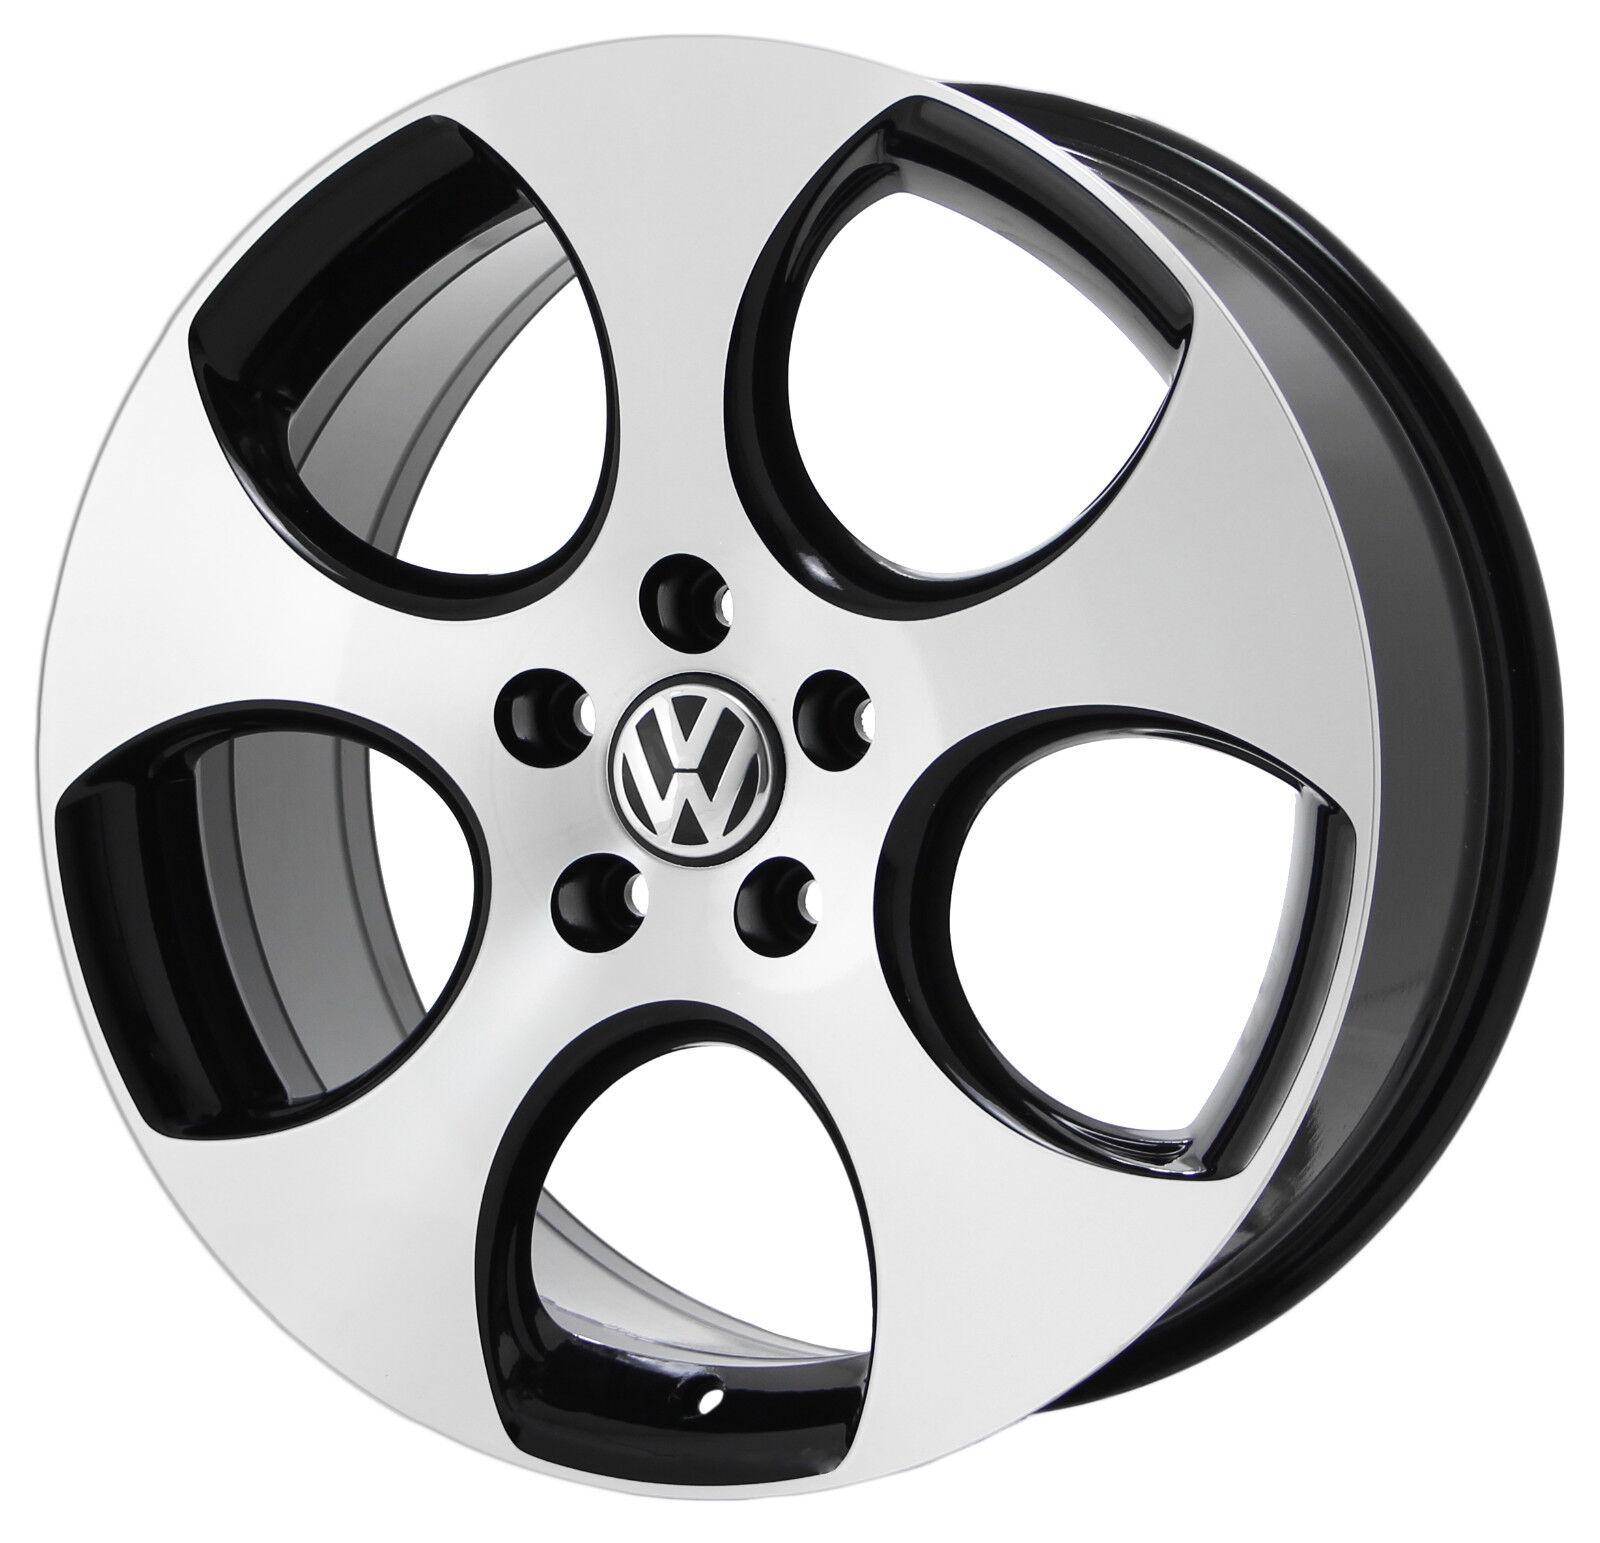 vw volkswagen golf s wheels alloy product passat rims audi gti santiago